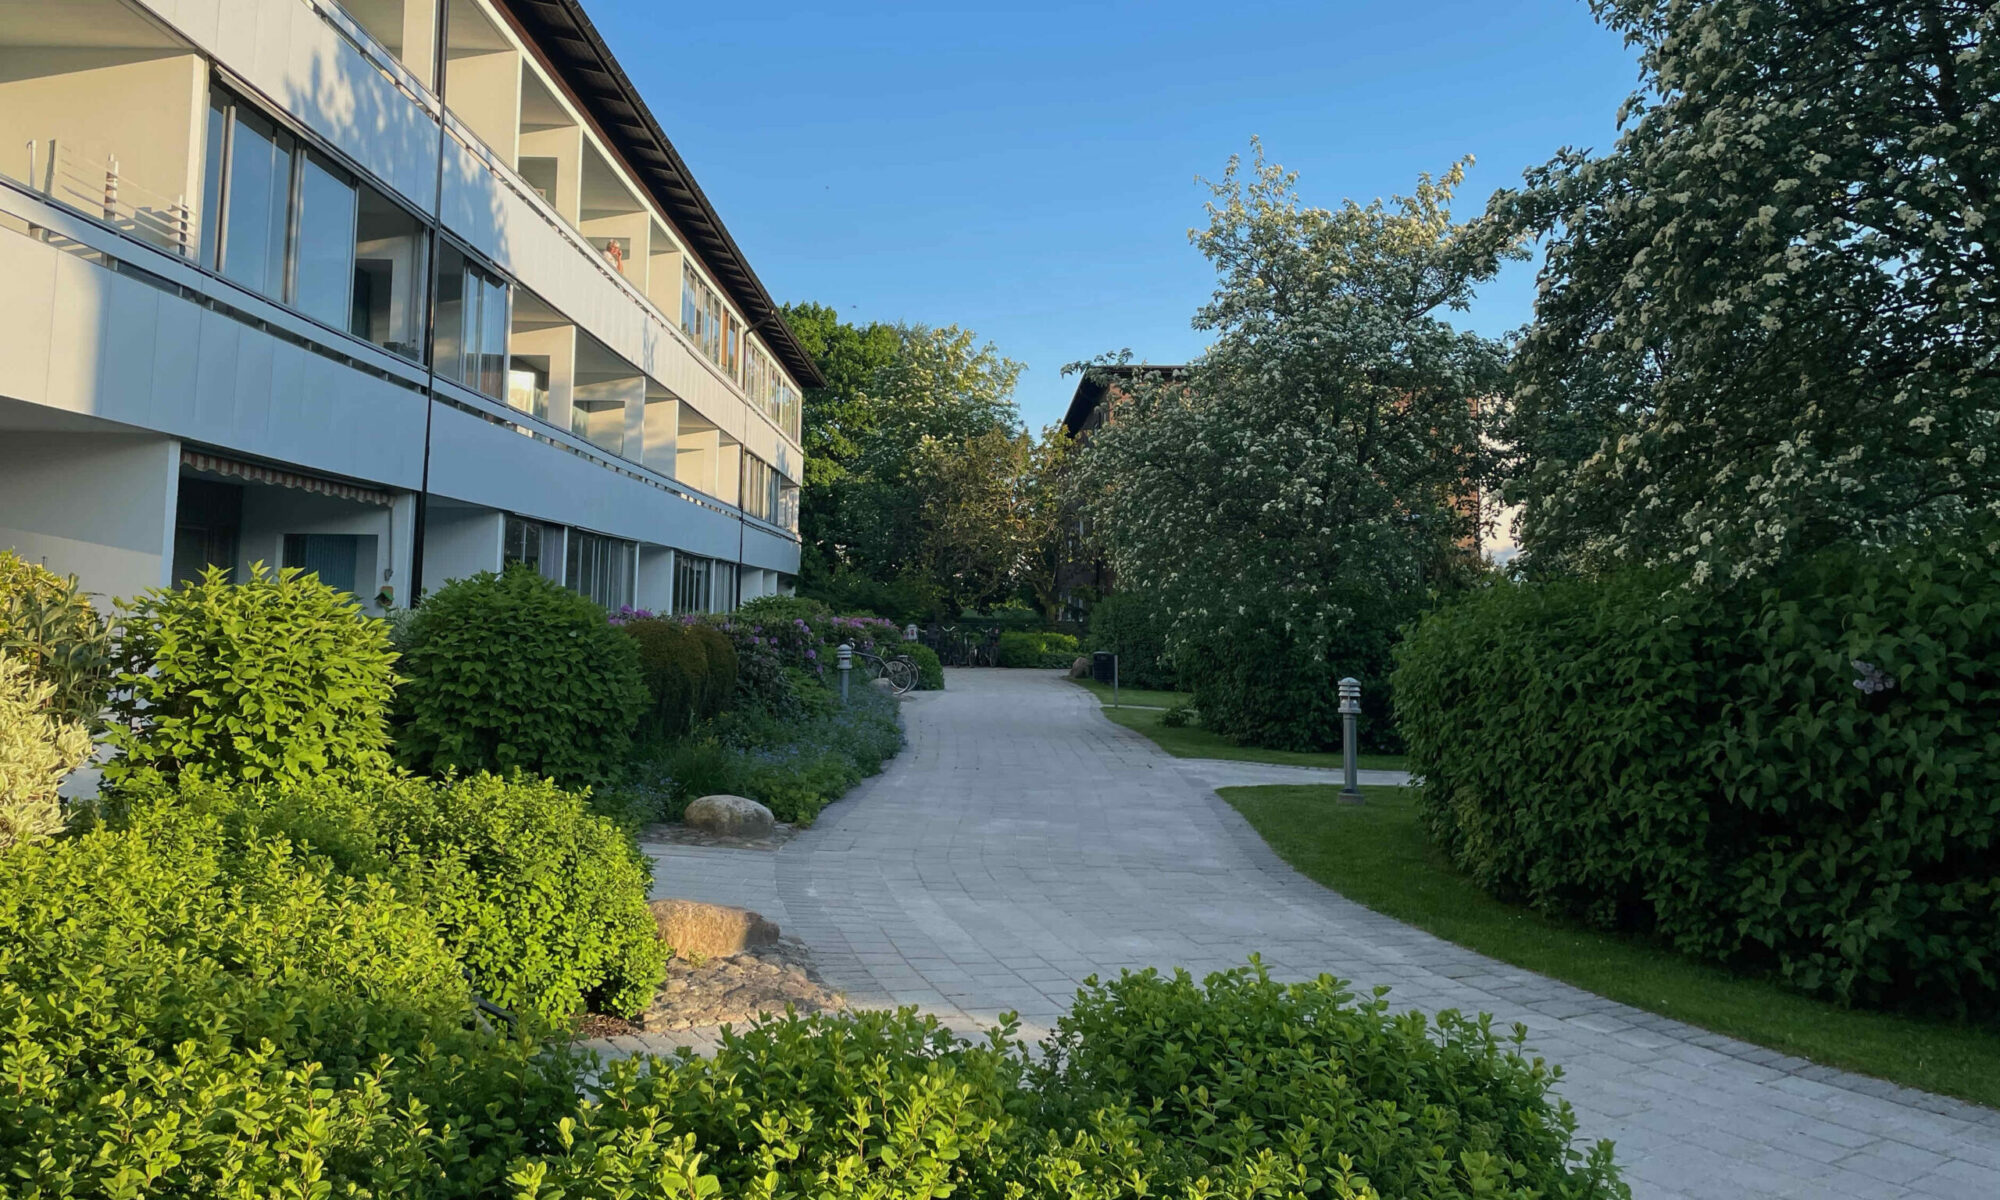 HSB Brf Svaneholm